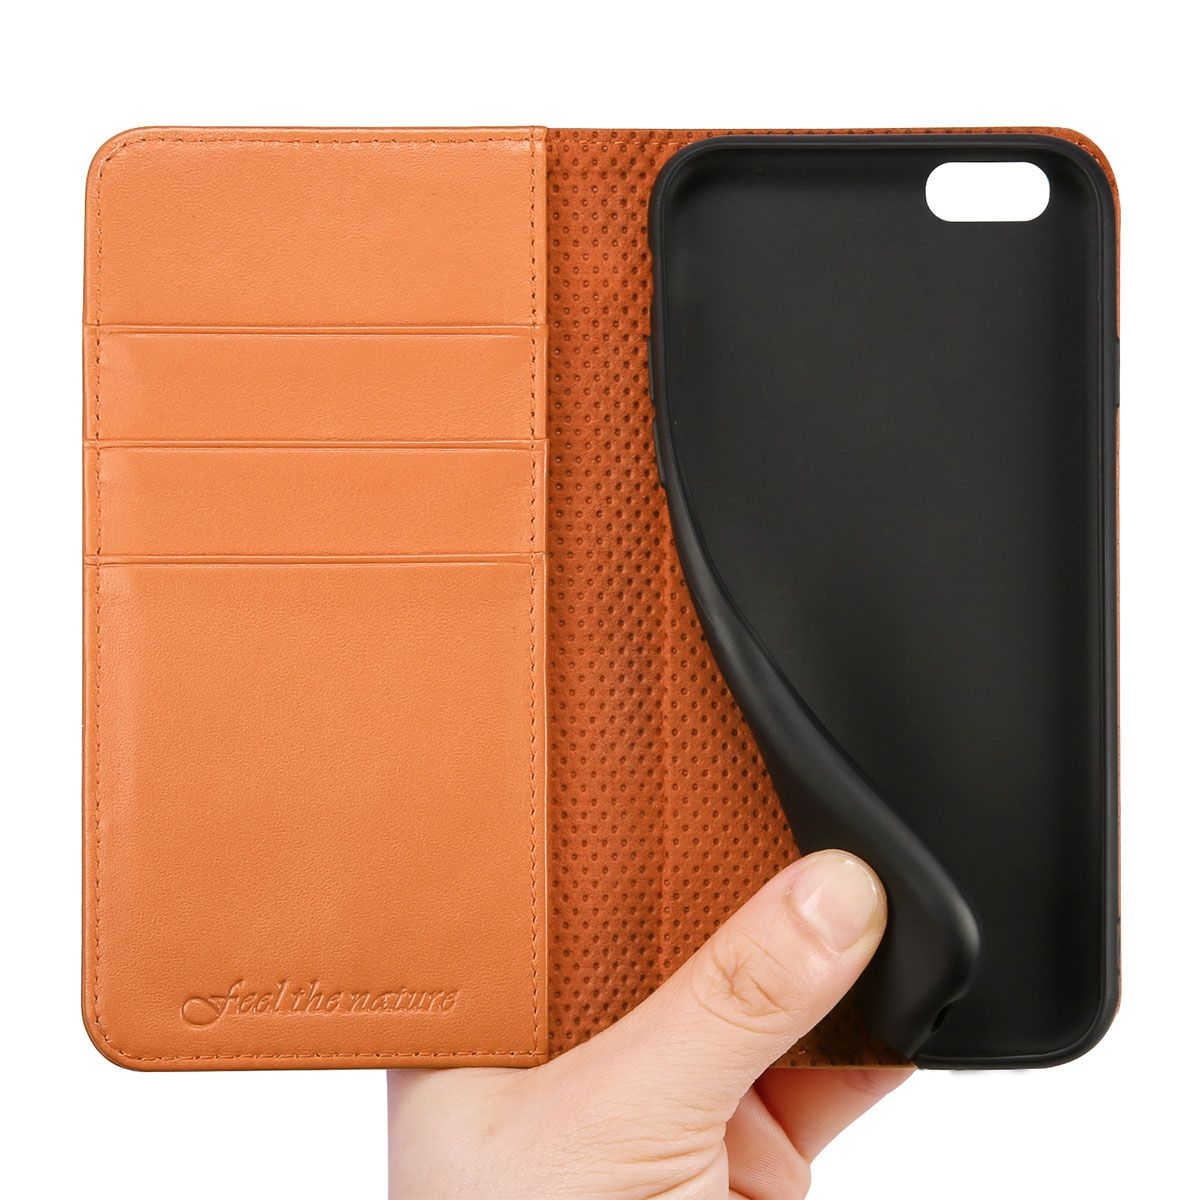 the best attitude 73cb1 de06c SHIELDON iPhone 6 Leather Book Flip Genuine Case, iPhone 6s Leather Wallet  Case